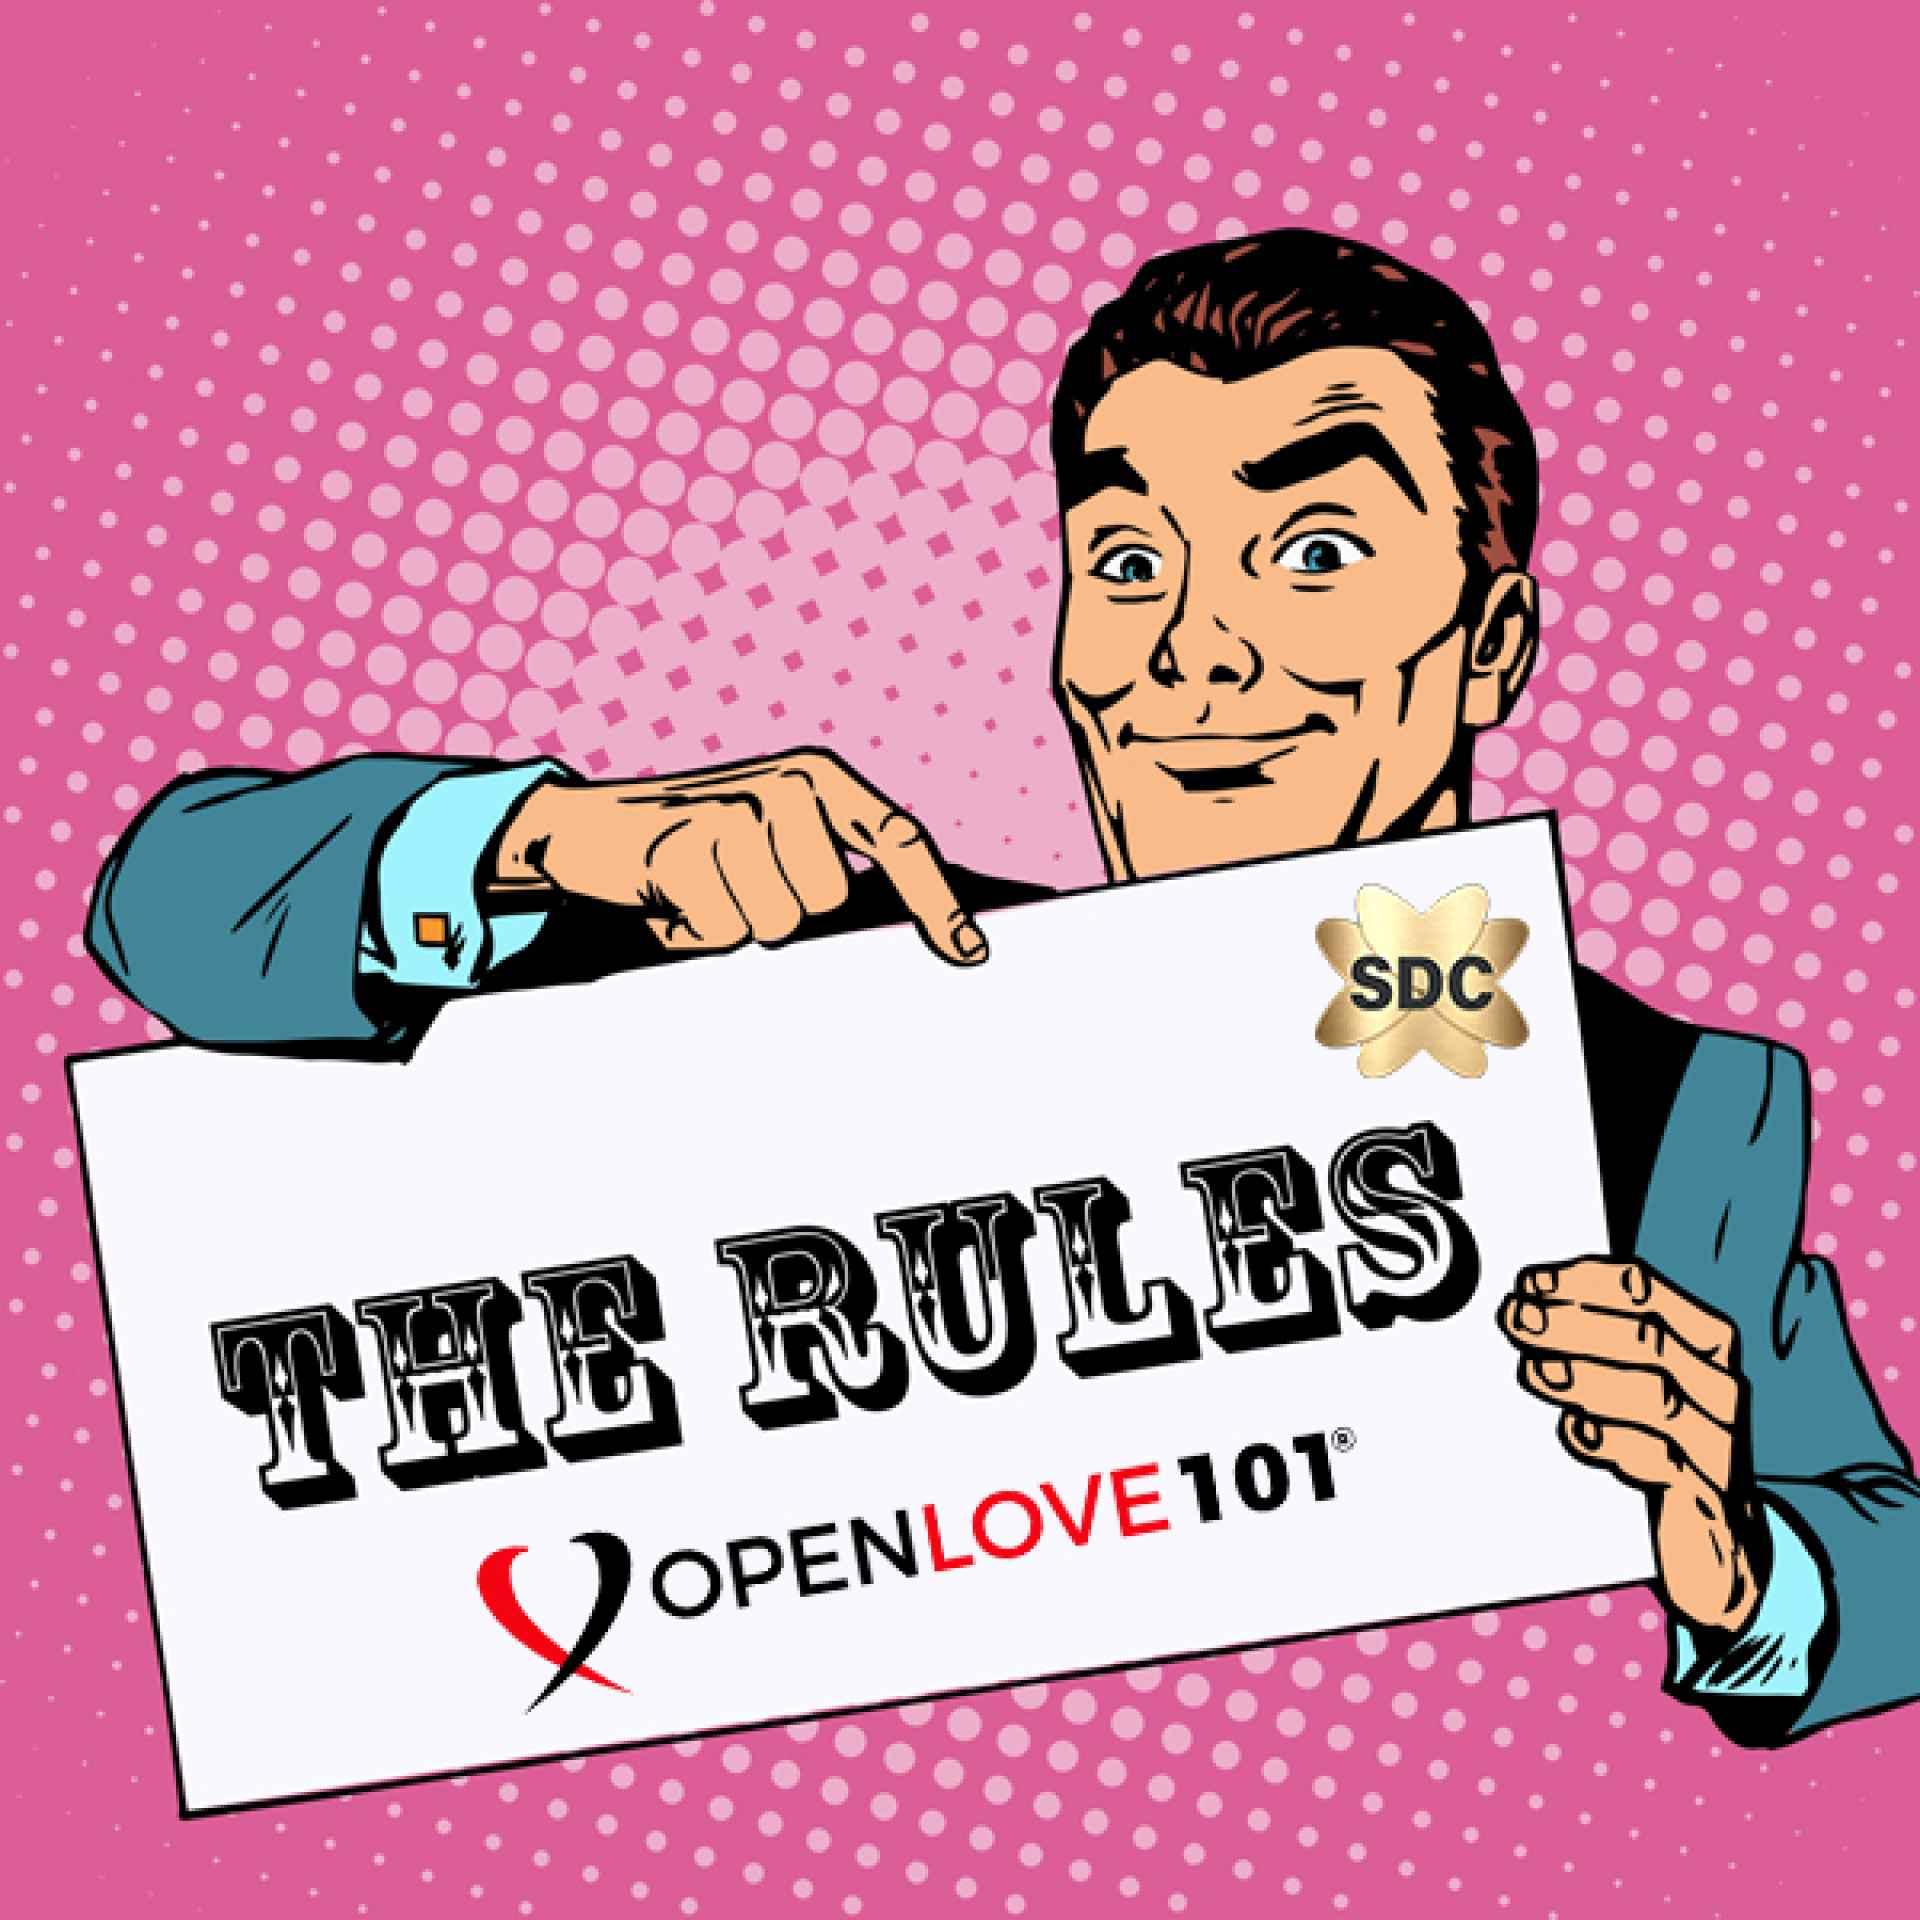 Regels voor Openlove 101 SDC Newbie Lifestyle Club Guide